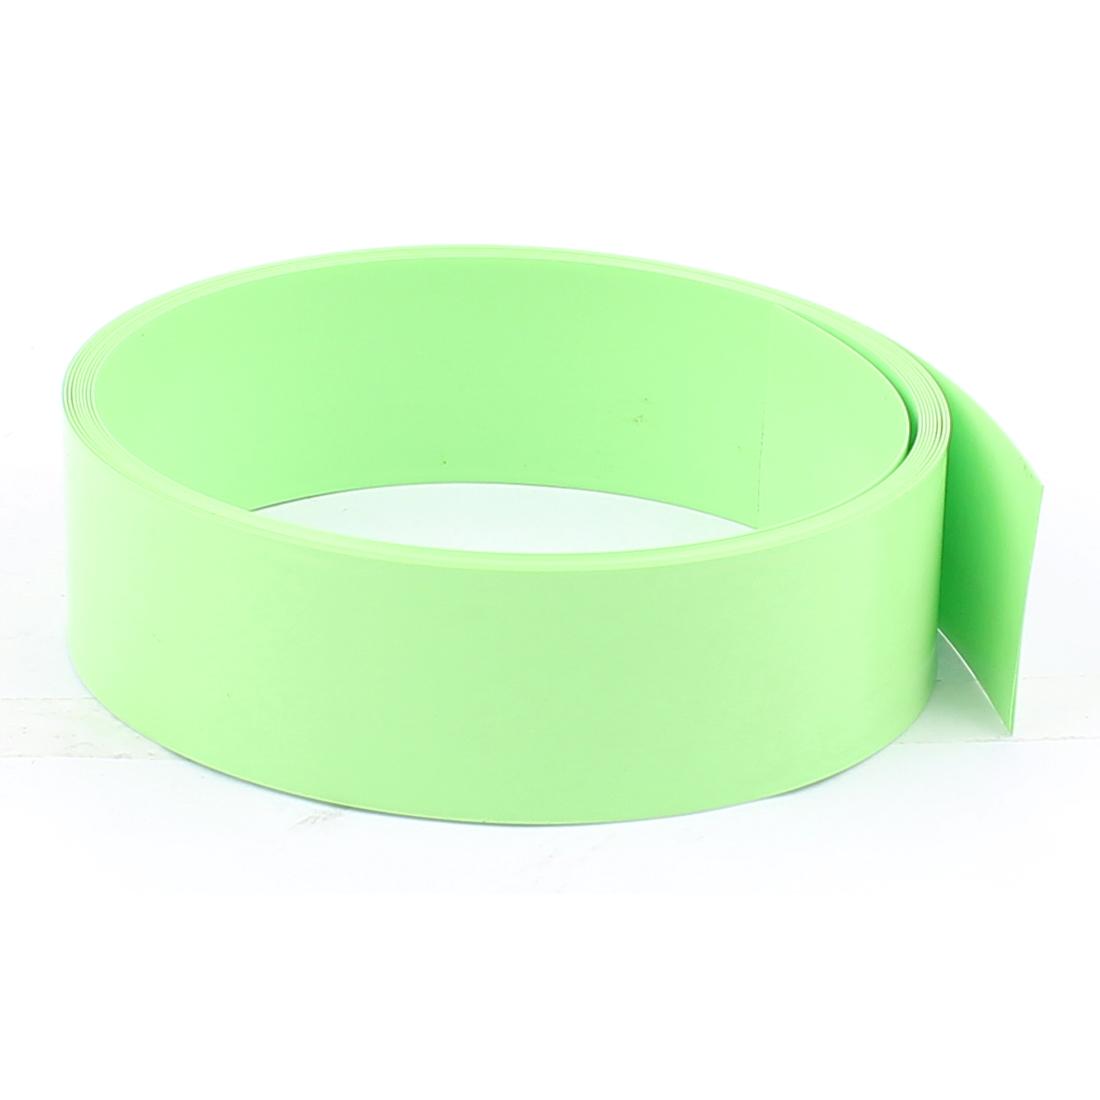 6.6ft 23mm Flat Width PVC Heat Shrink Tubing Fruit Green for 1 x AA Battery Pack